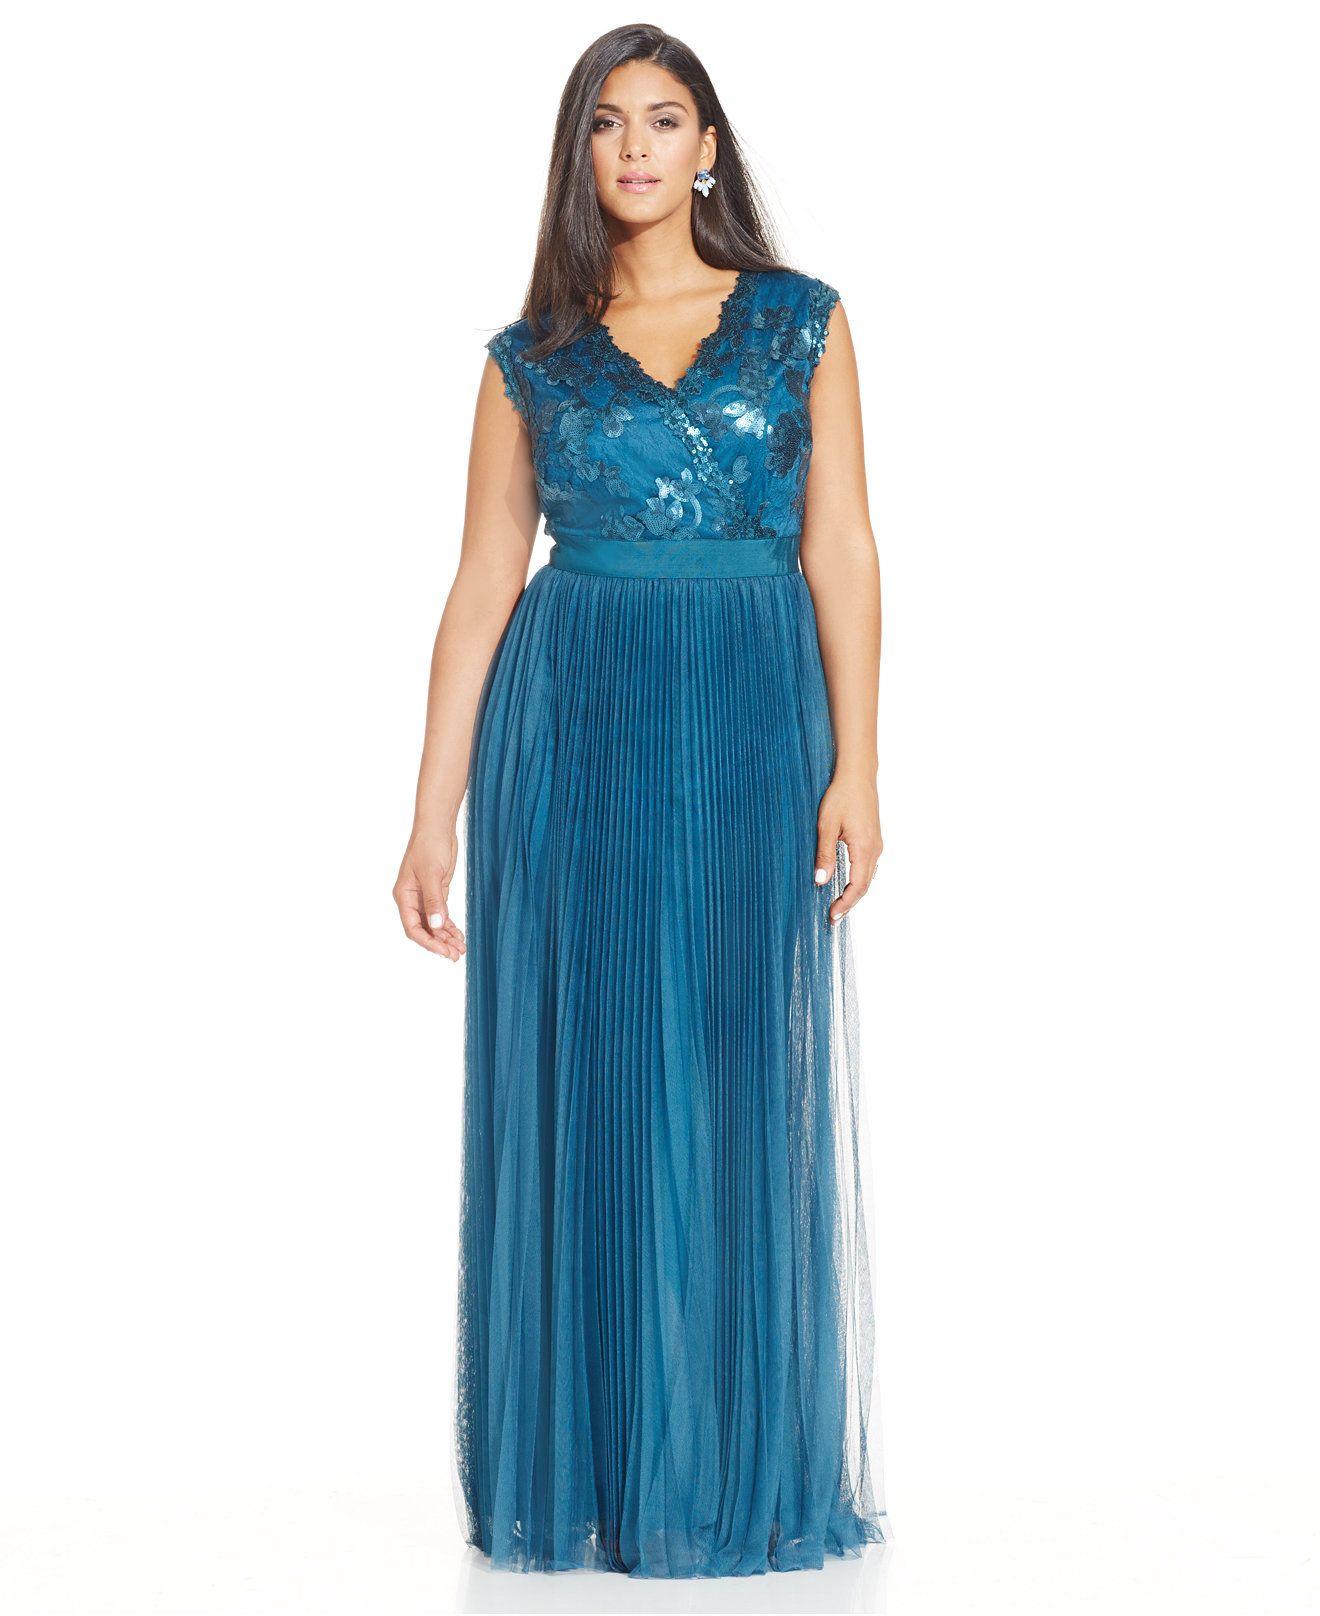 long sparkly dresses uk